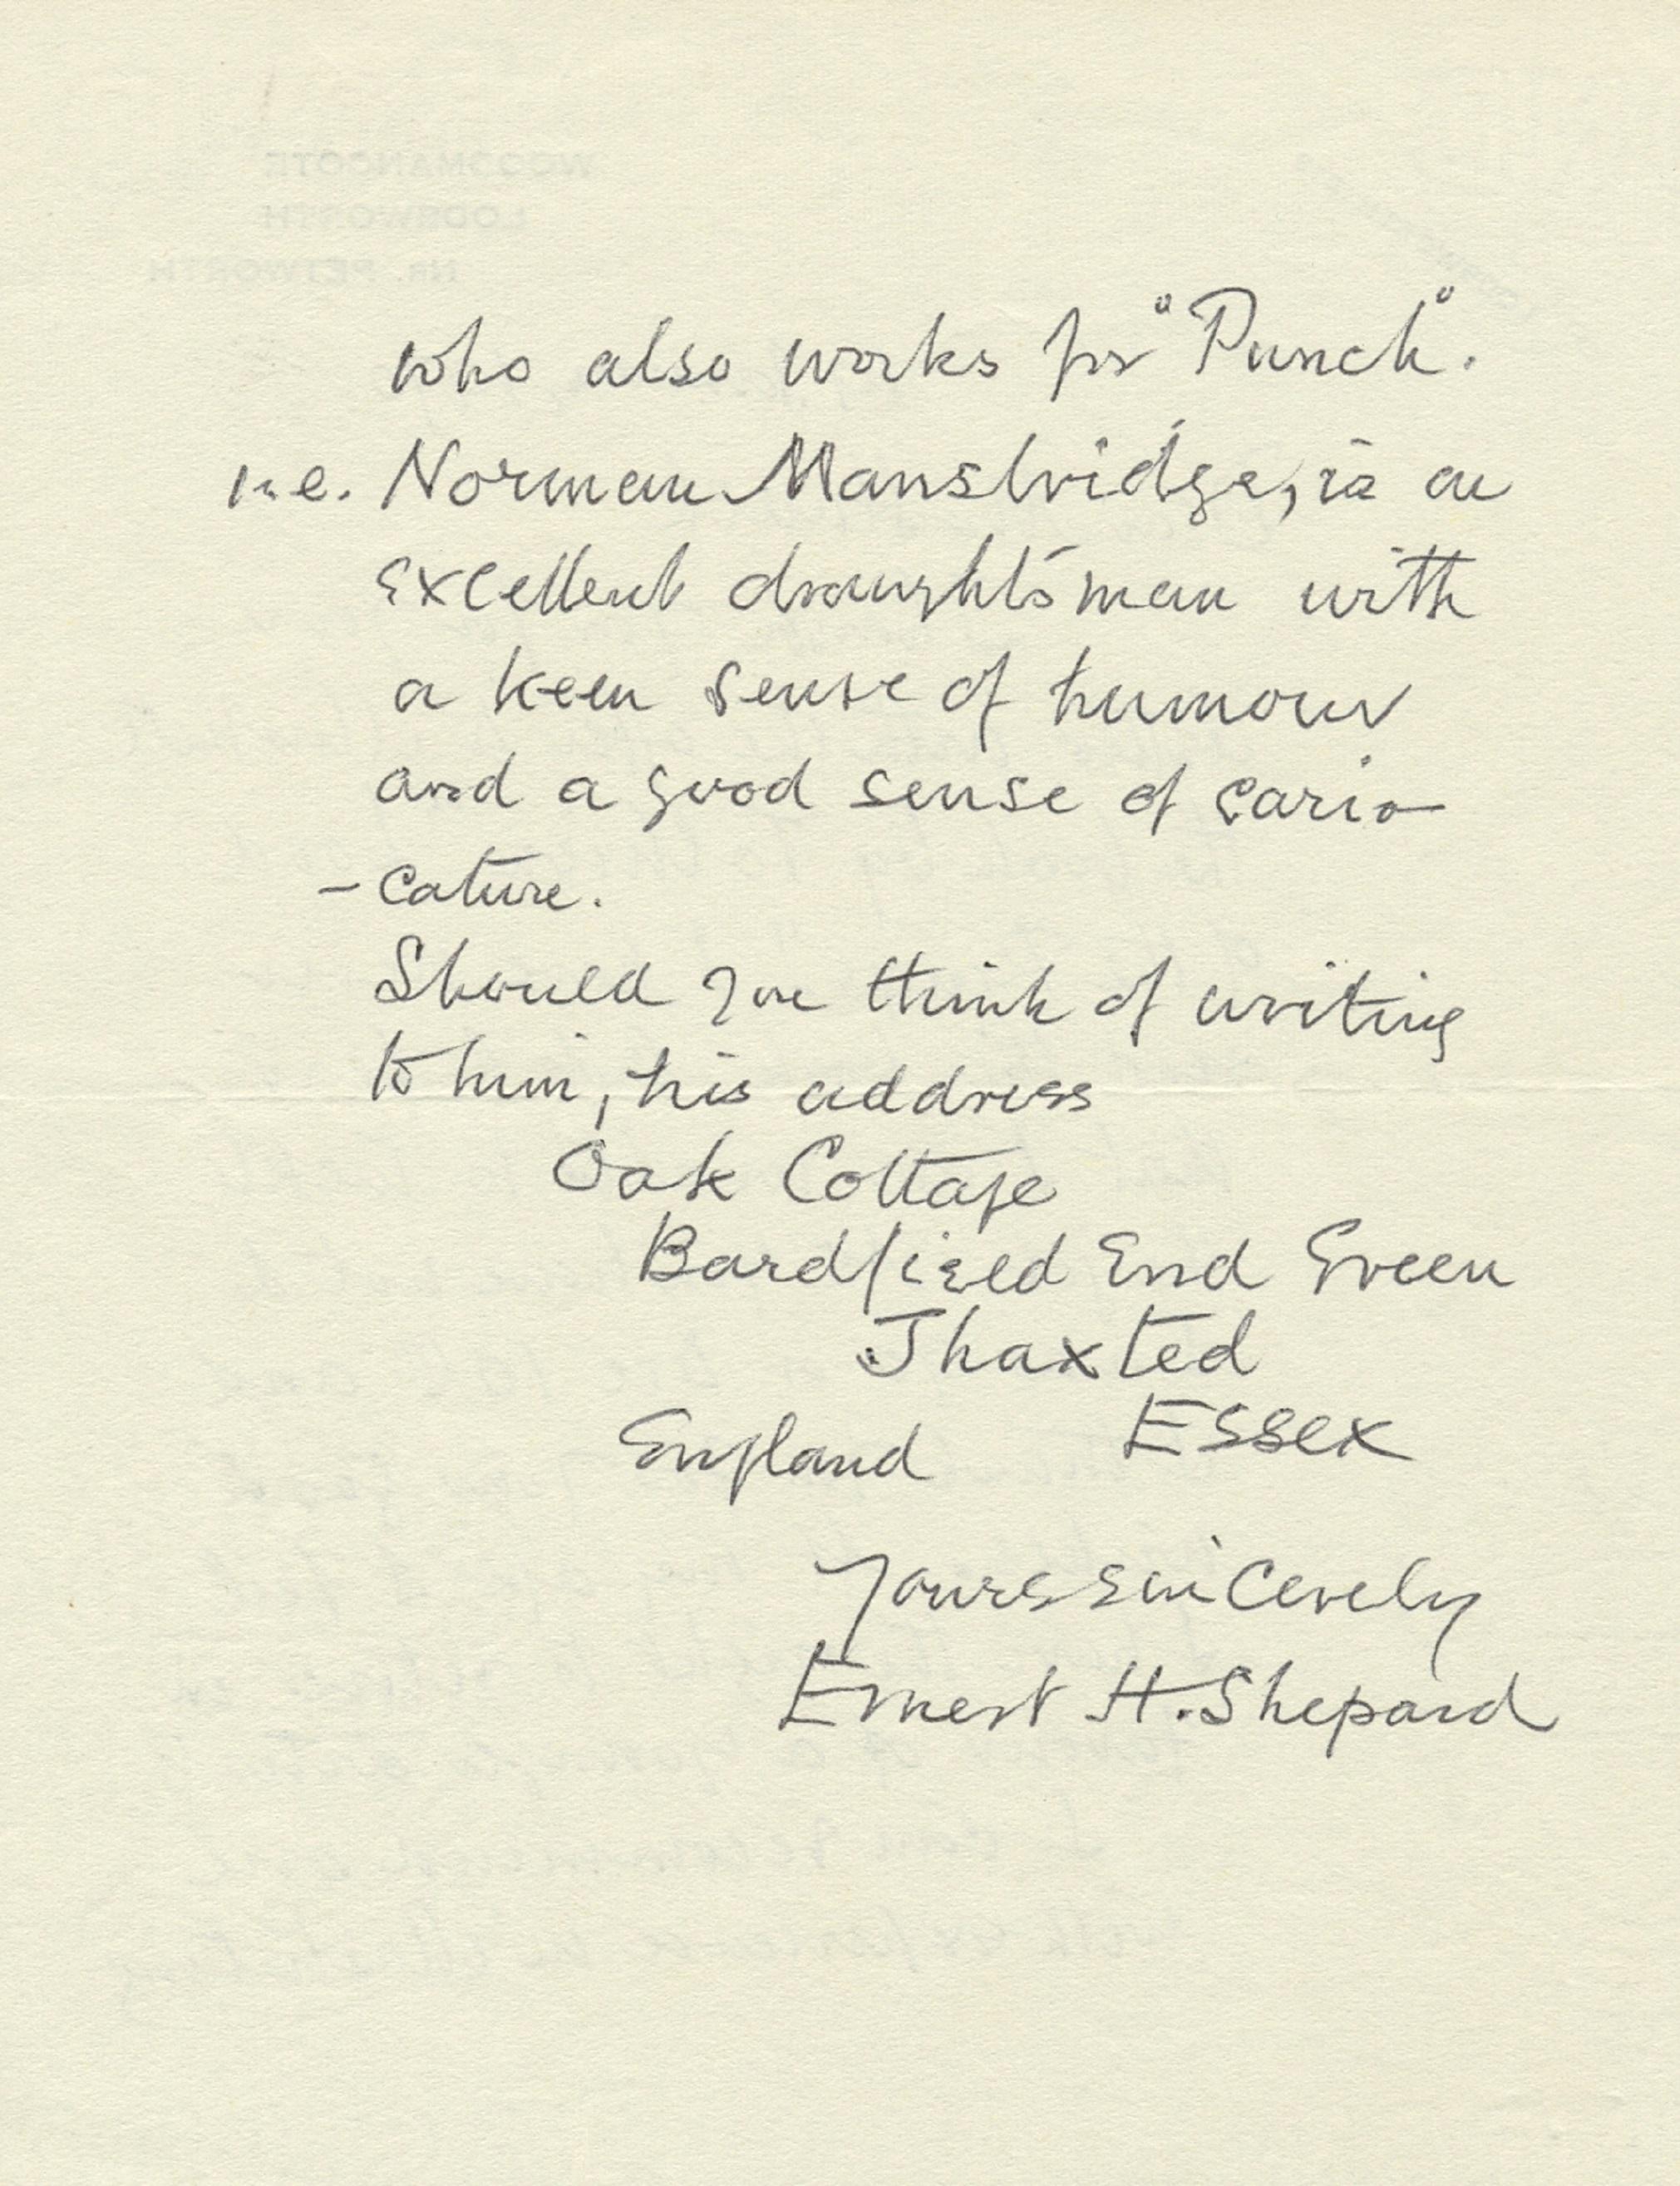 Lot 264 - SHEPARD ERNEST H.: (1879-1976) English Artist and book Illustrator.